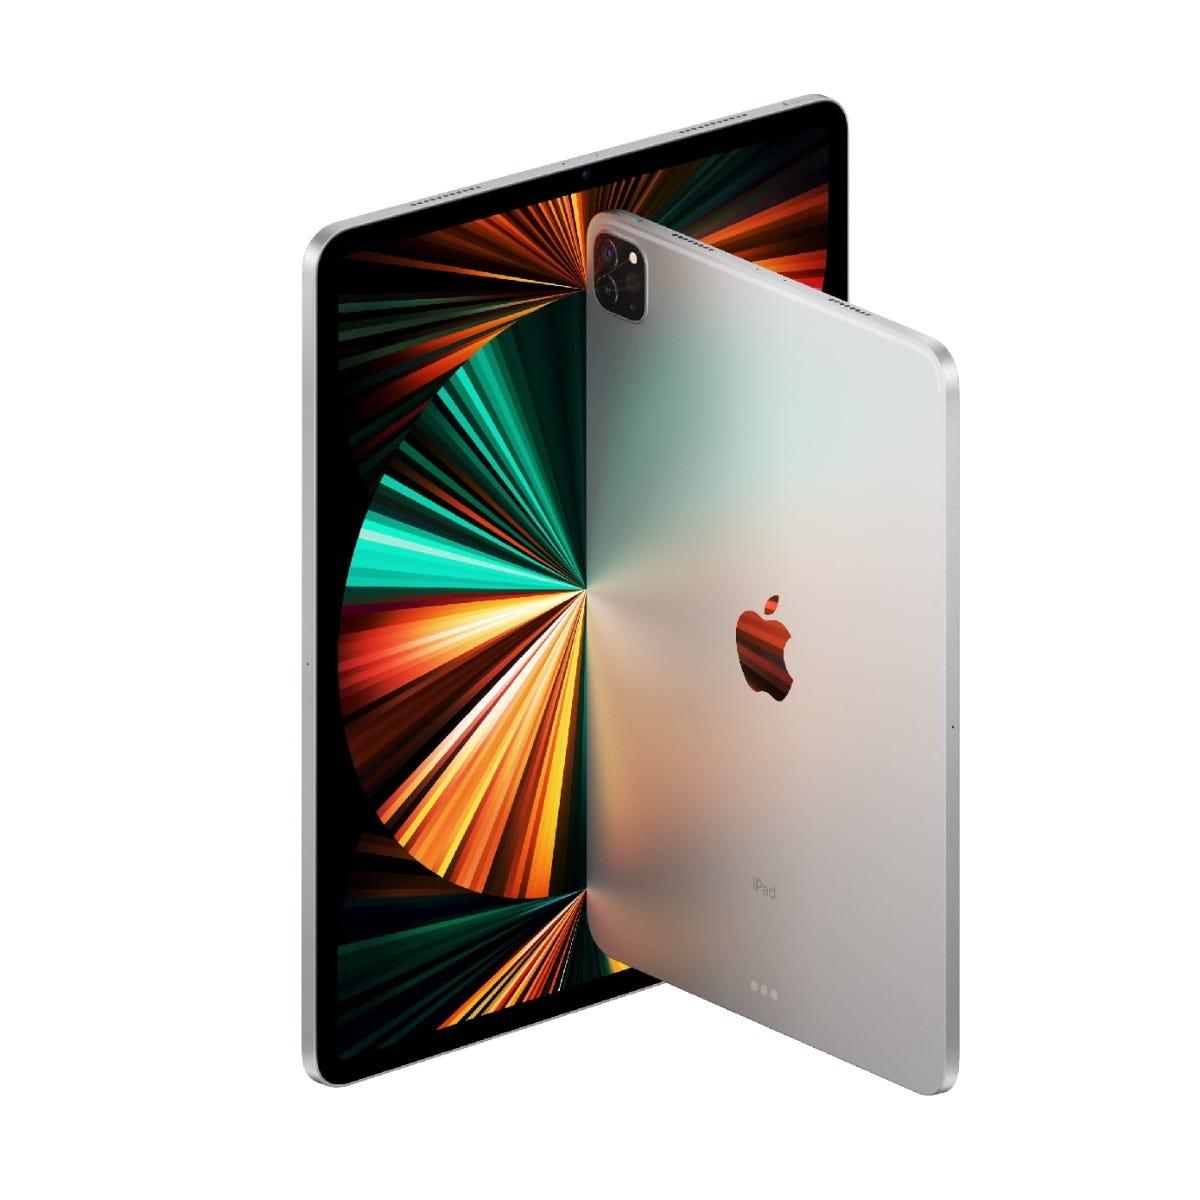 Apple 11-inch iPad Pro